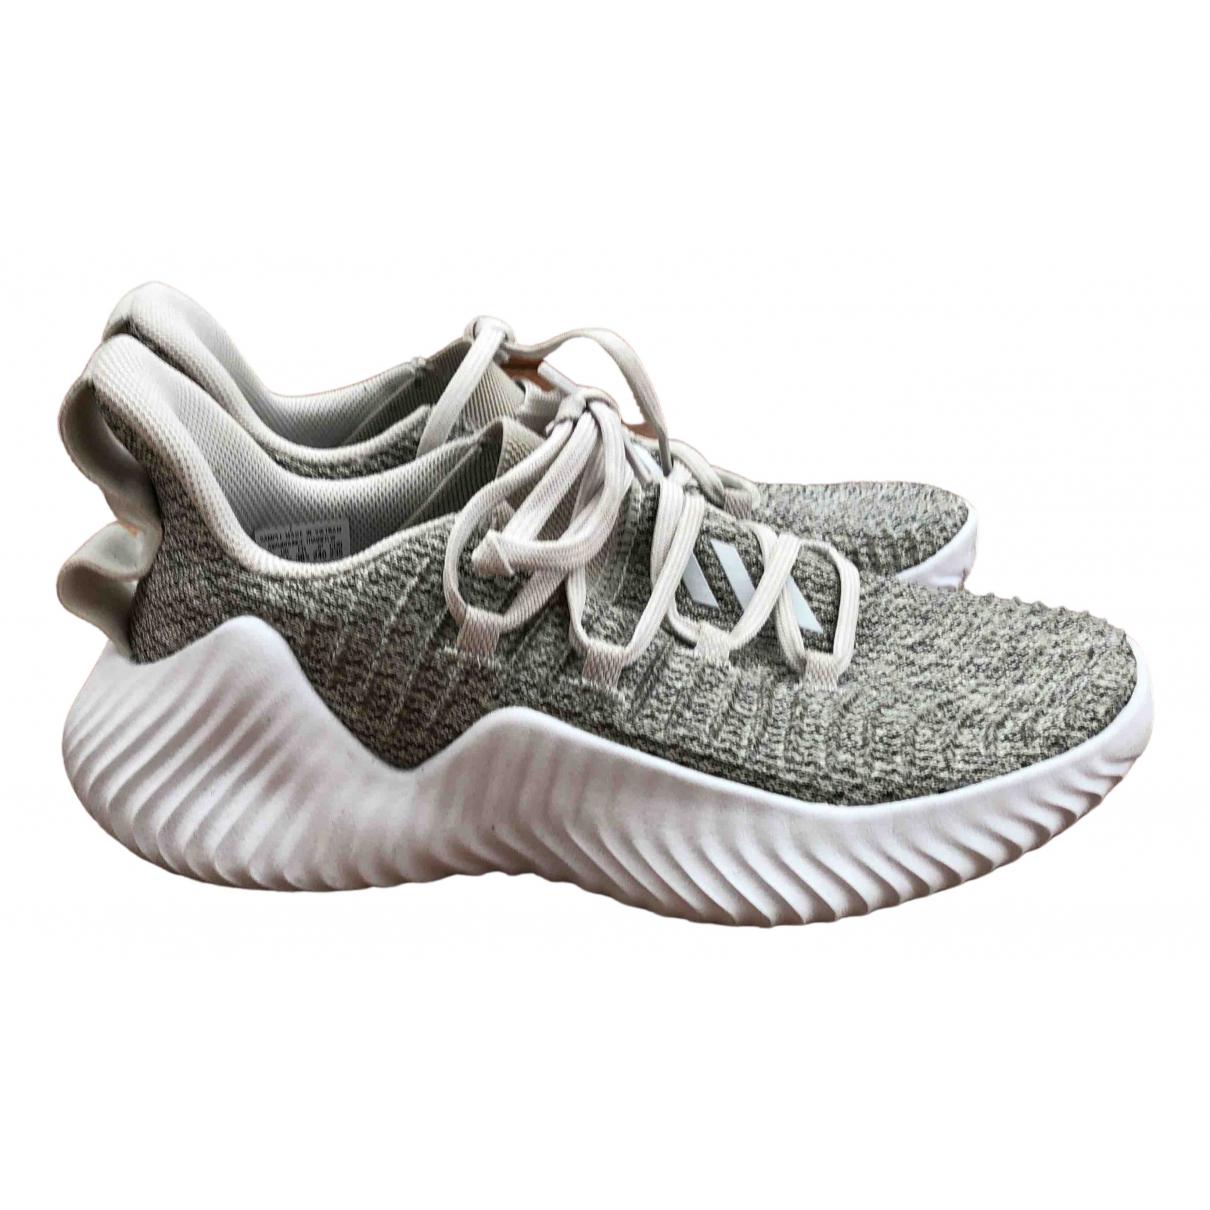 Adidas N Grey Cloth Trainers for Women 7 US